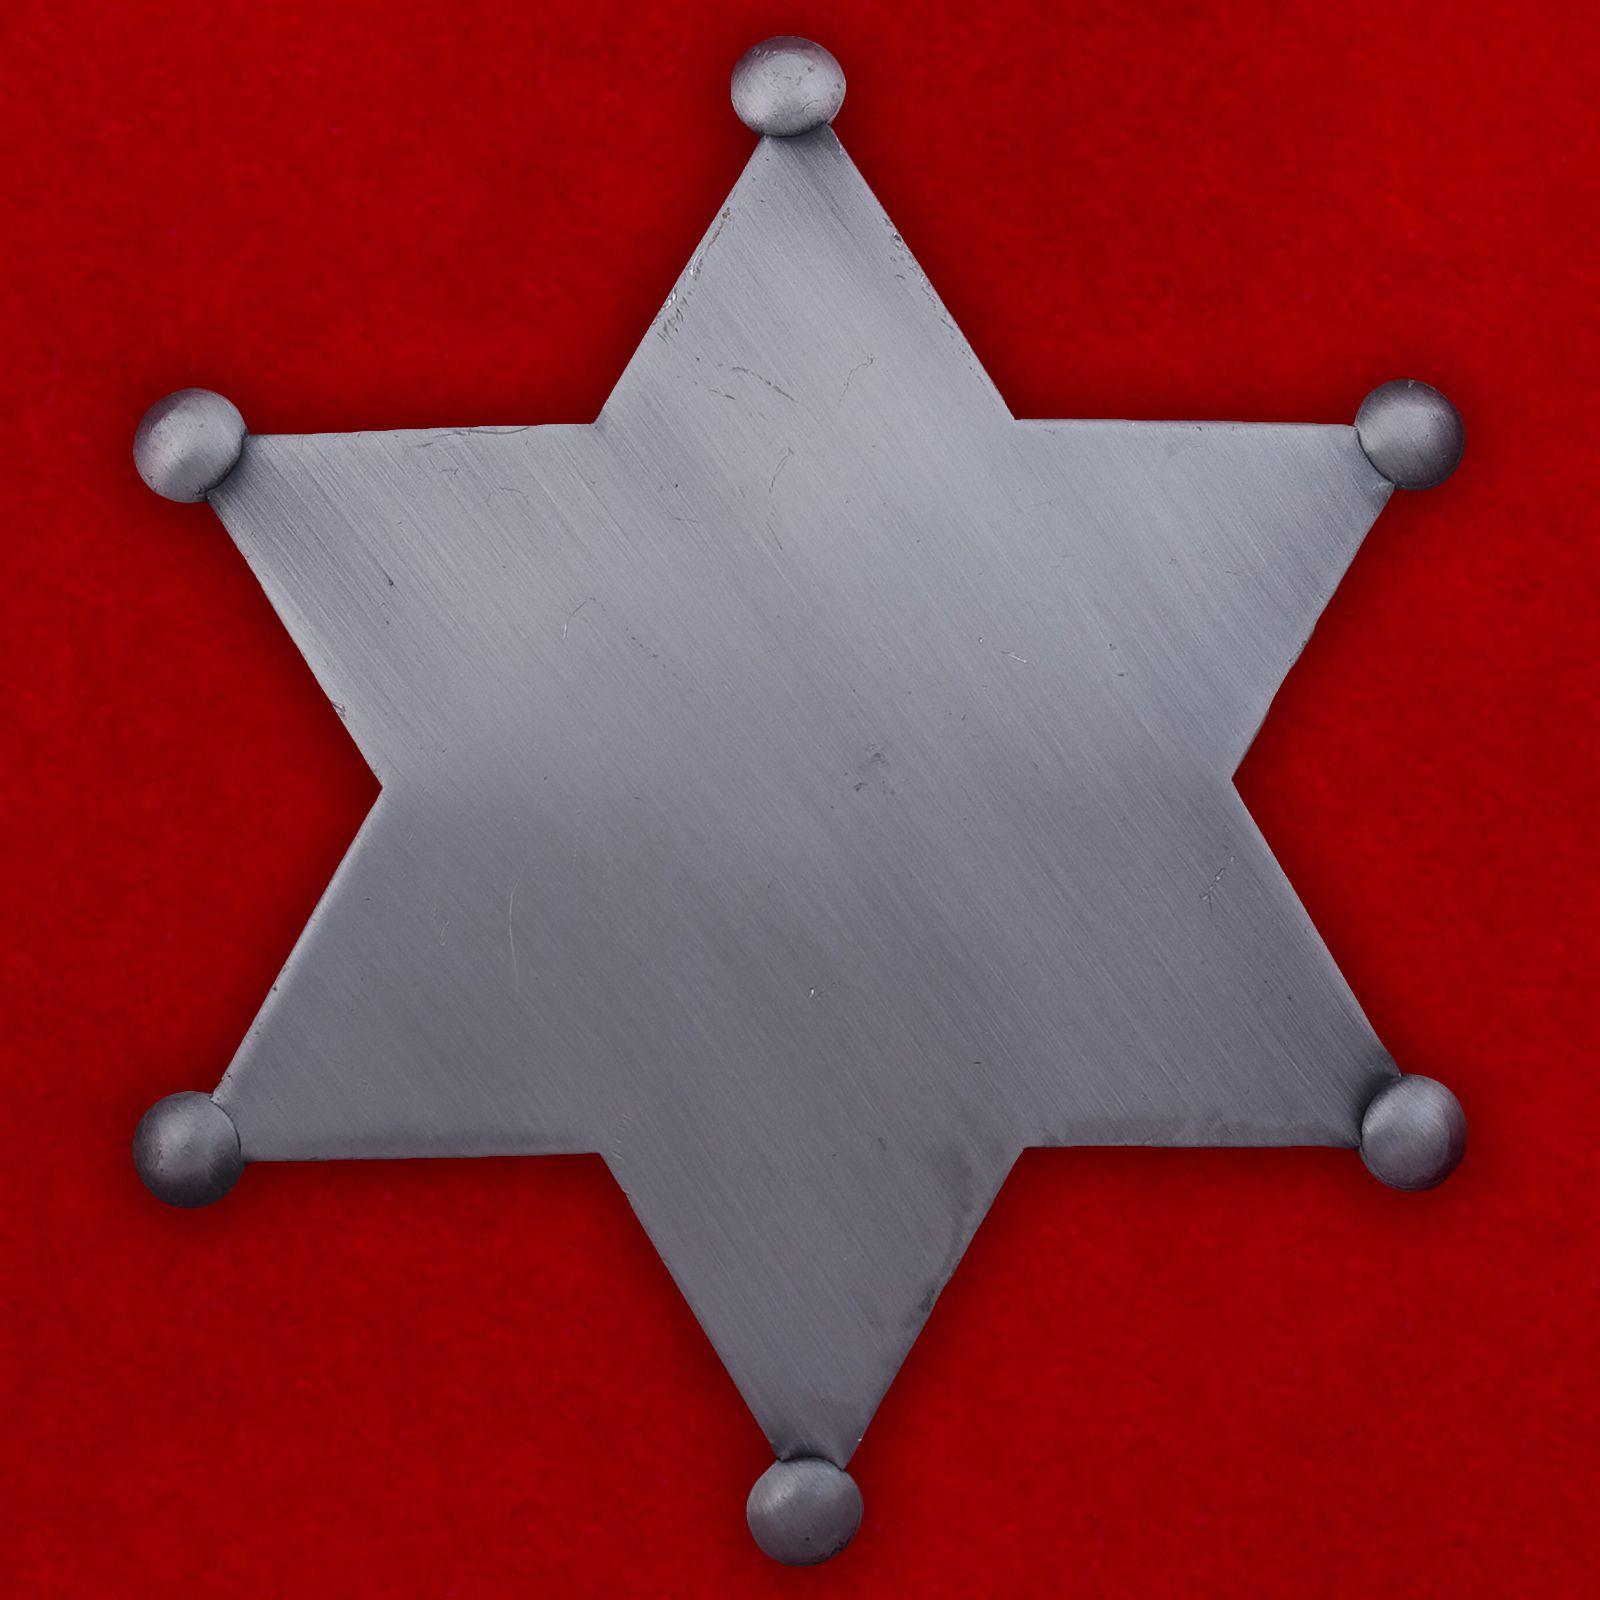 Звезда американского шерифа